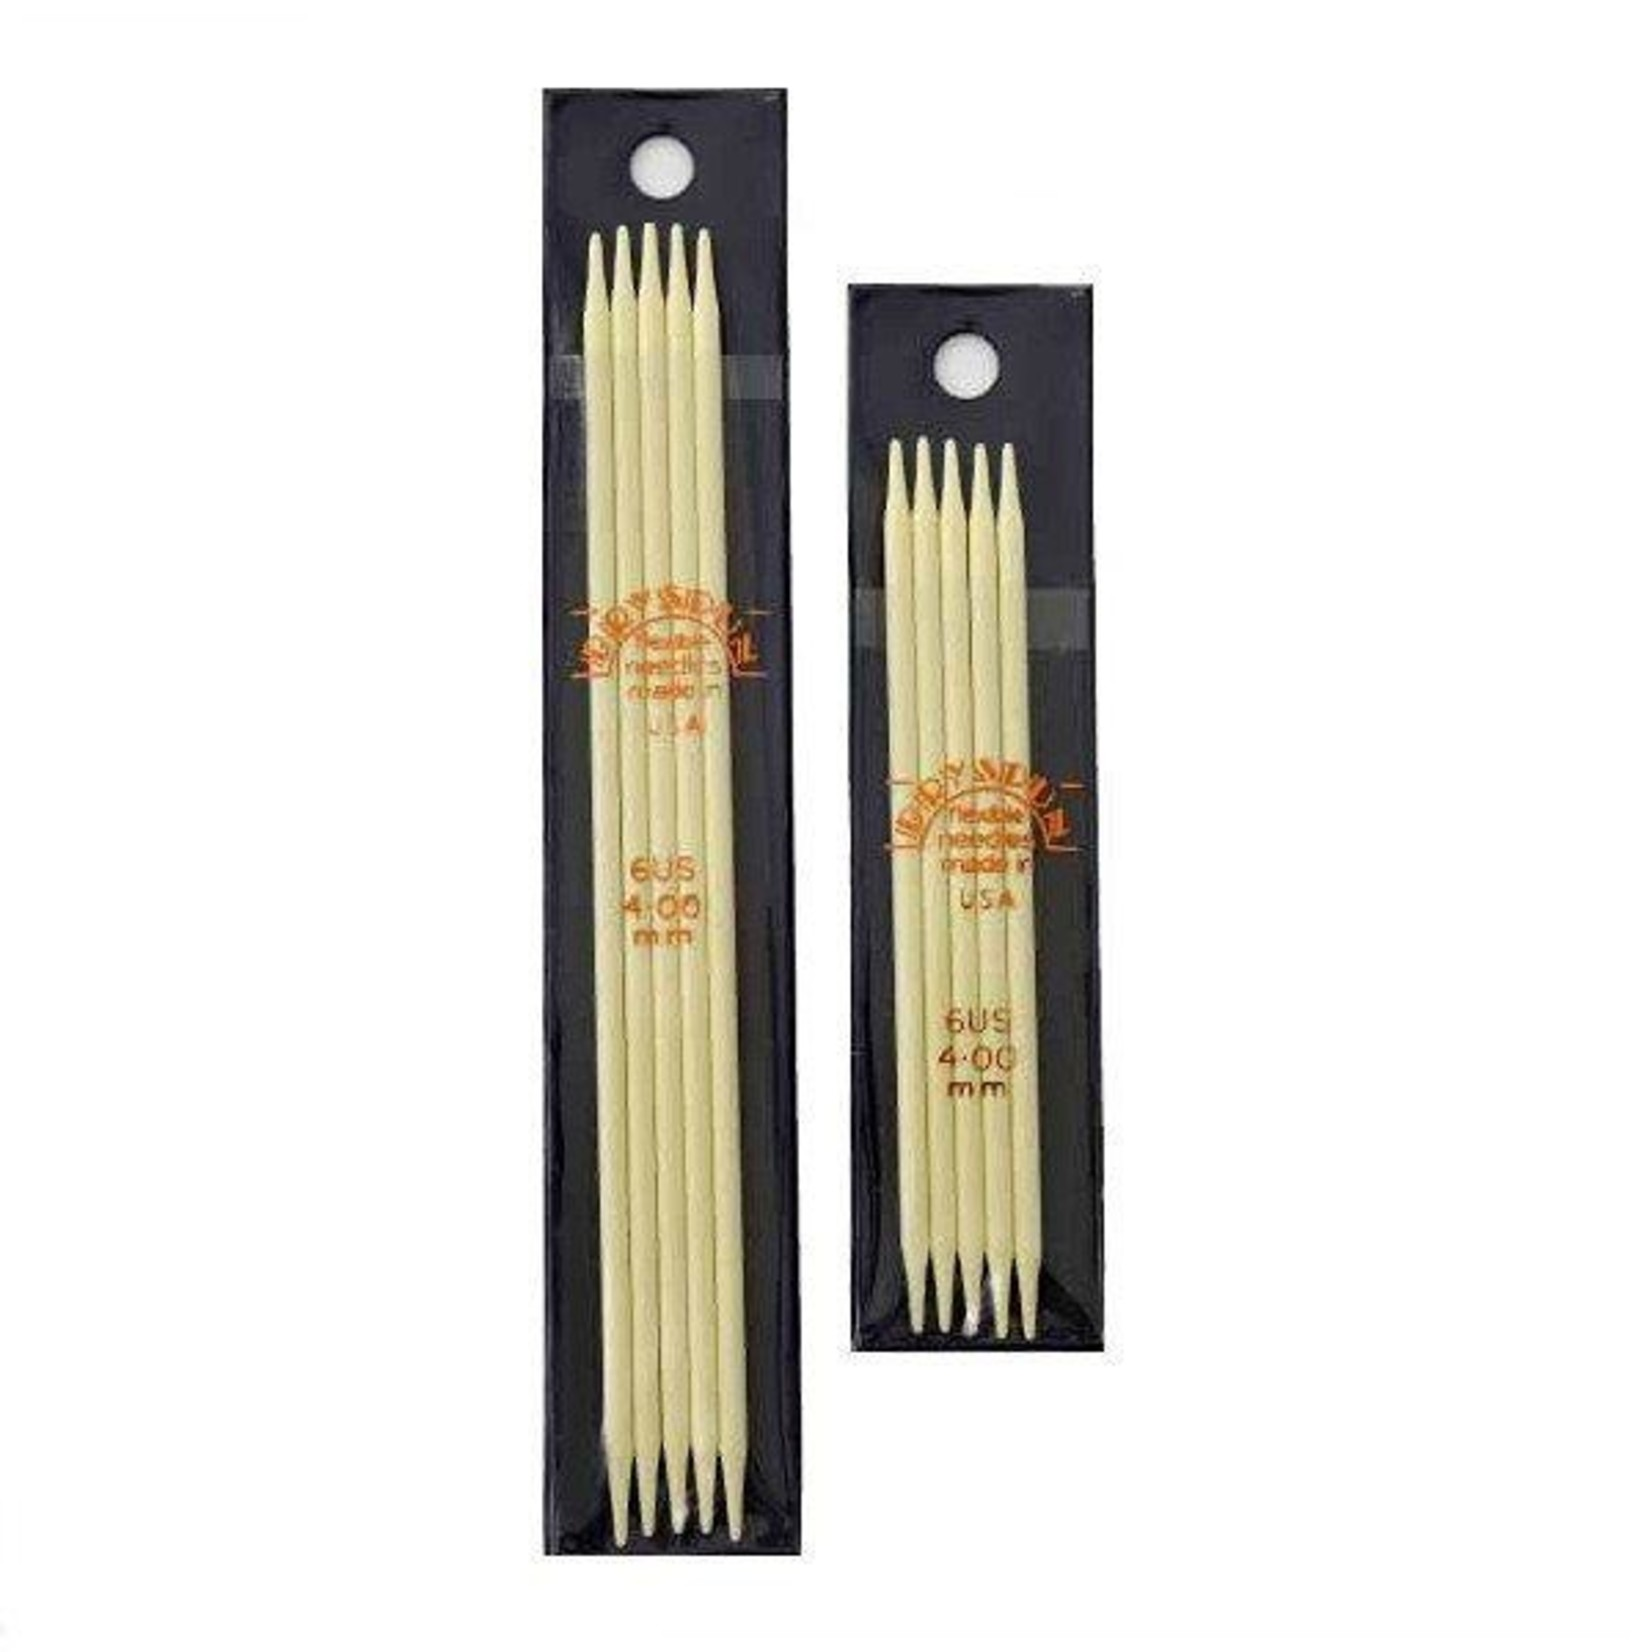 "Bryspun Bryspun 7.5"" Double Pointed Knitting Needles"